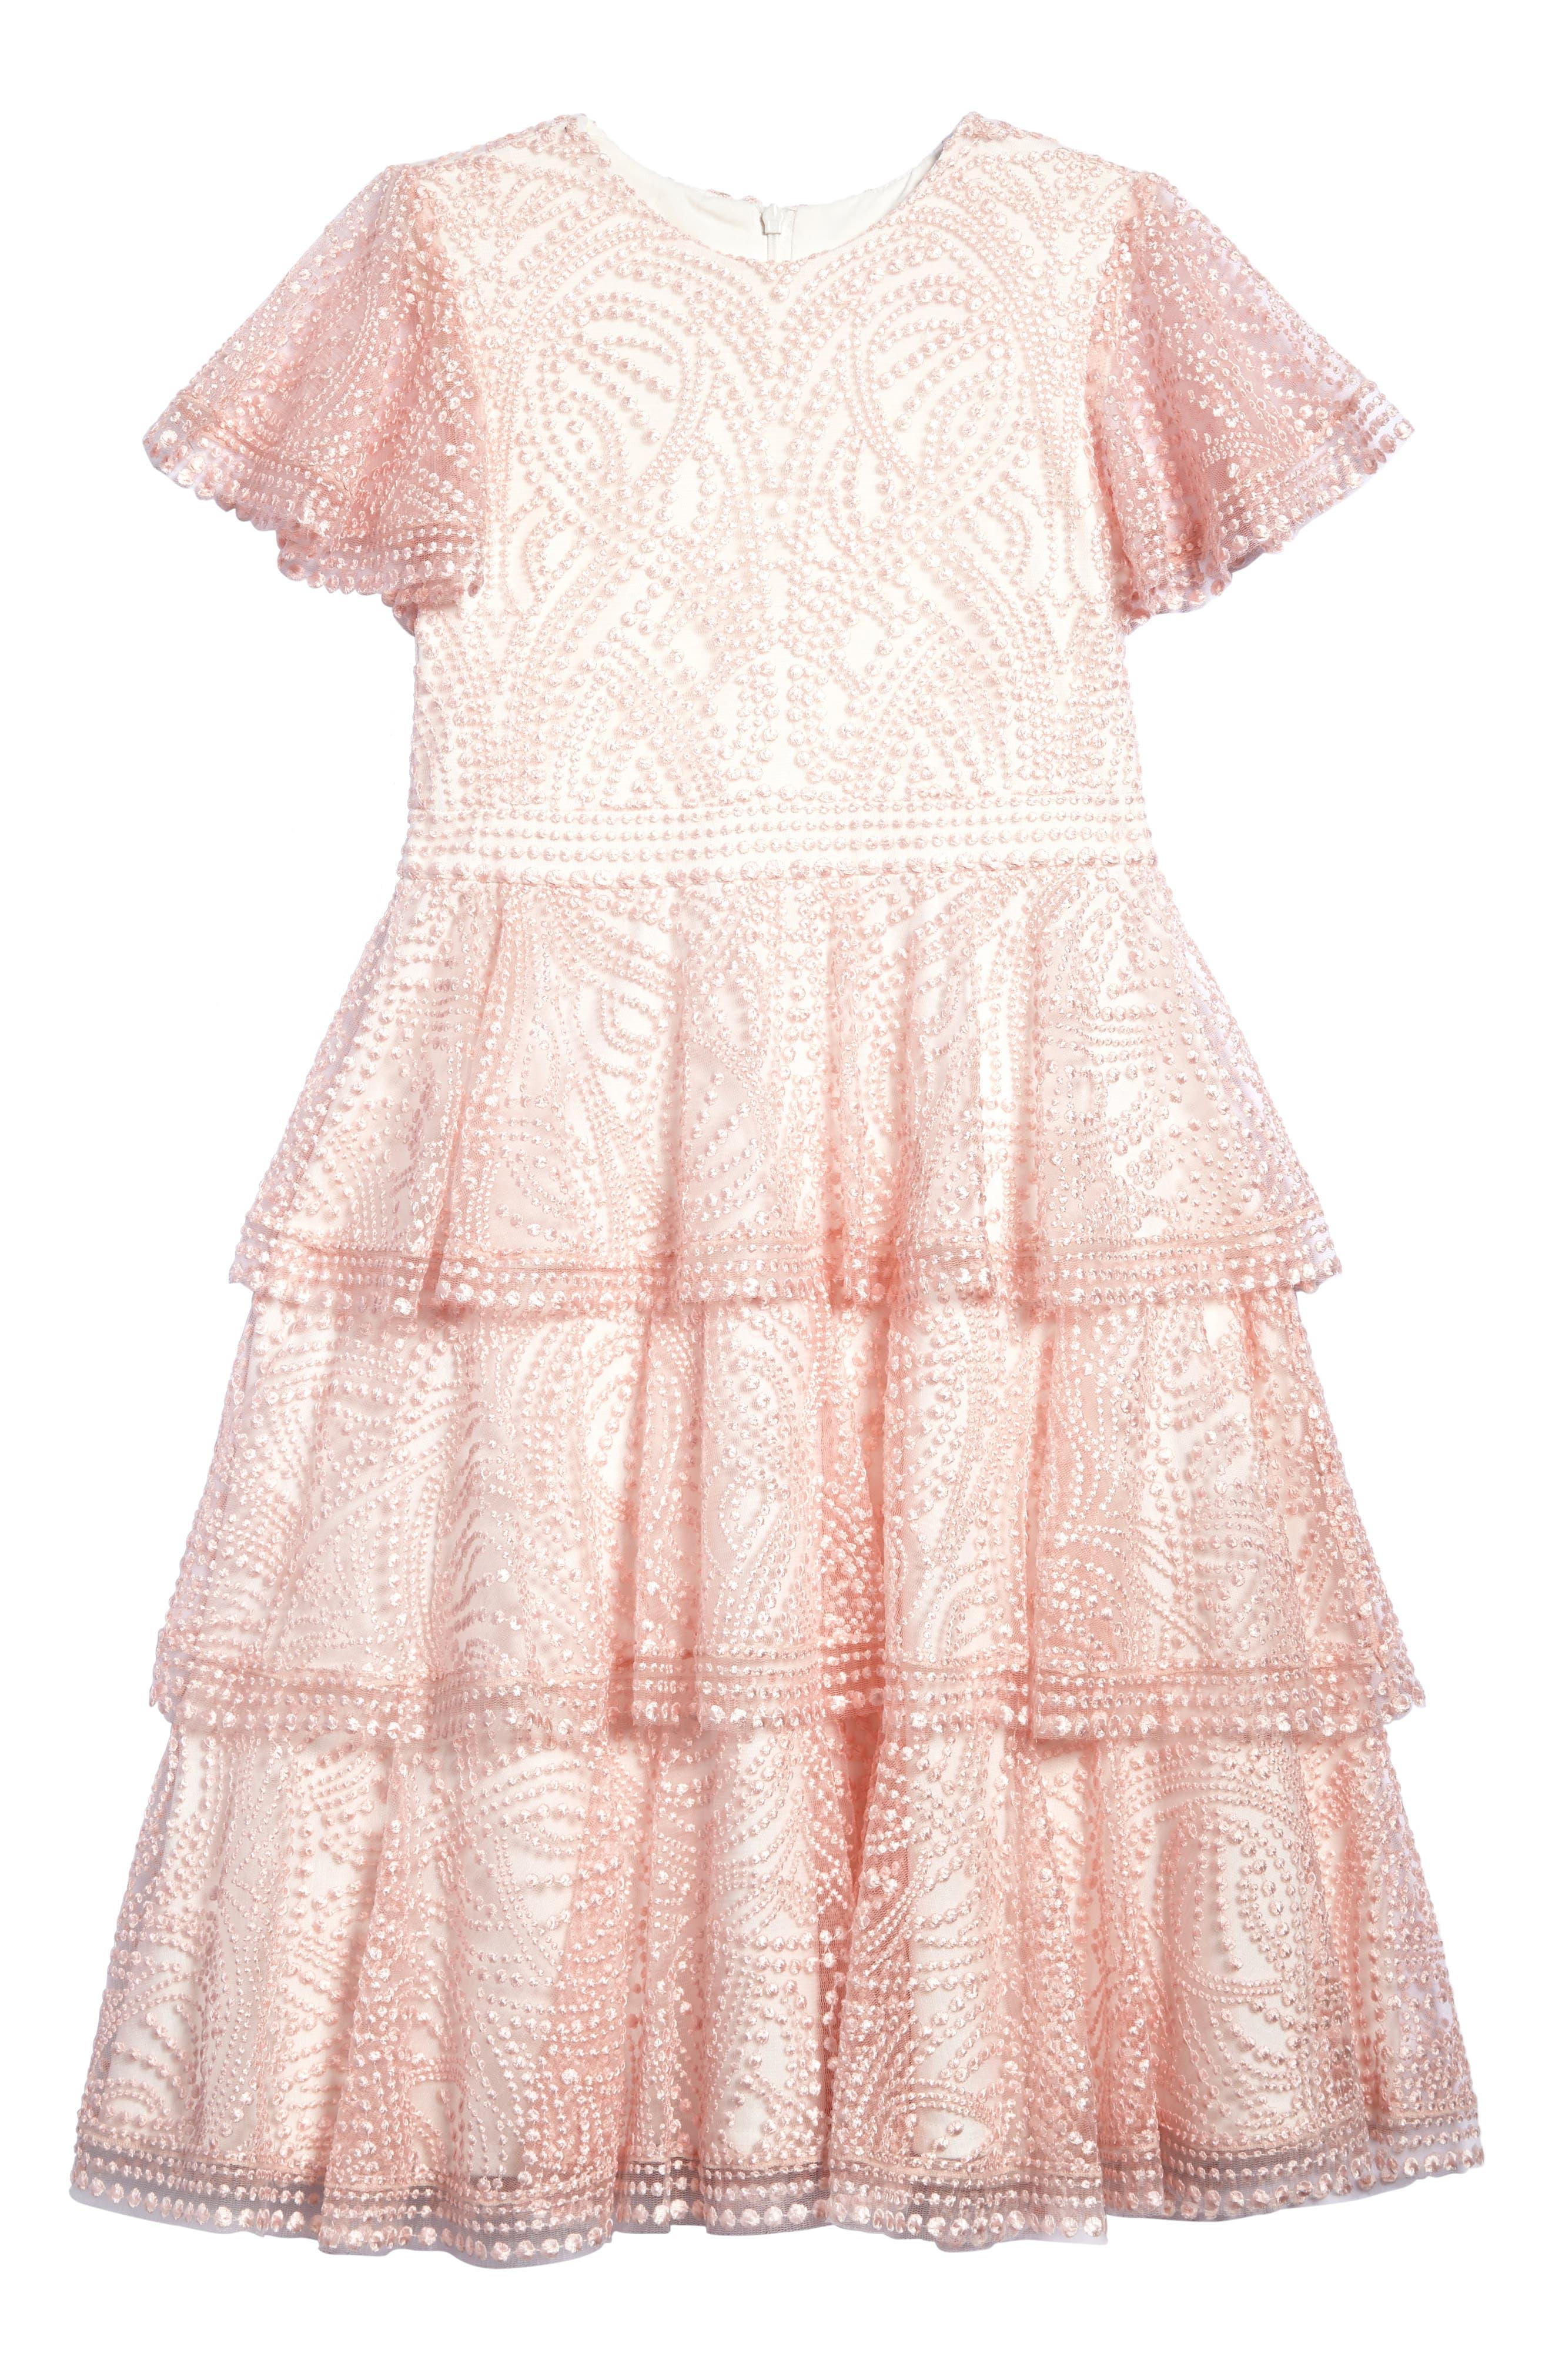 Alternate Image 1 Selected - Tadashi Shoji Embroidered Ruffle Dress (Toddler Girls, Little Girls & Big Girls)